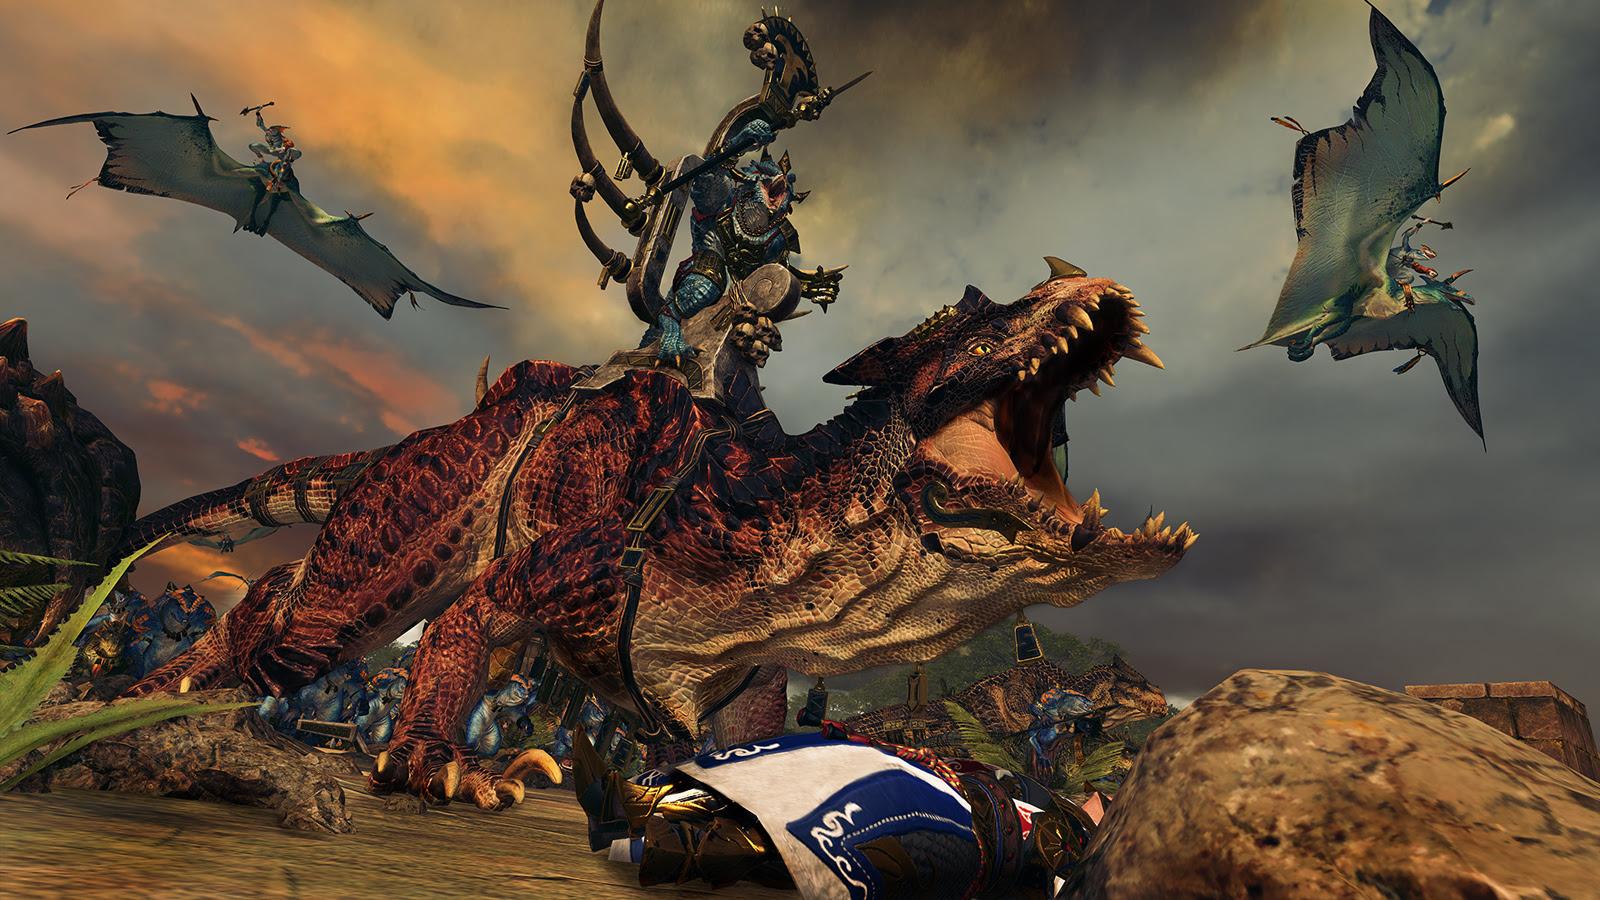 Looks like Total War: Warhammer II is off to a good start screenshot